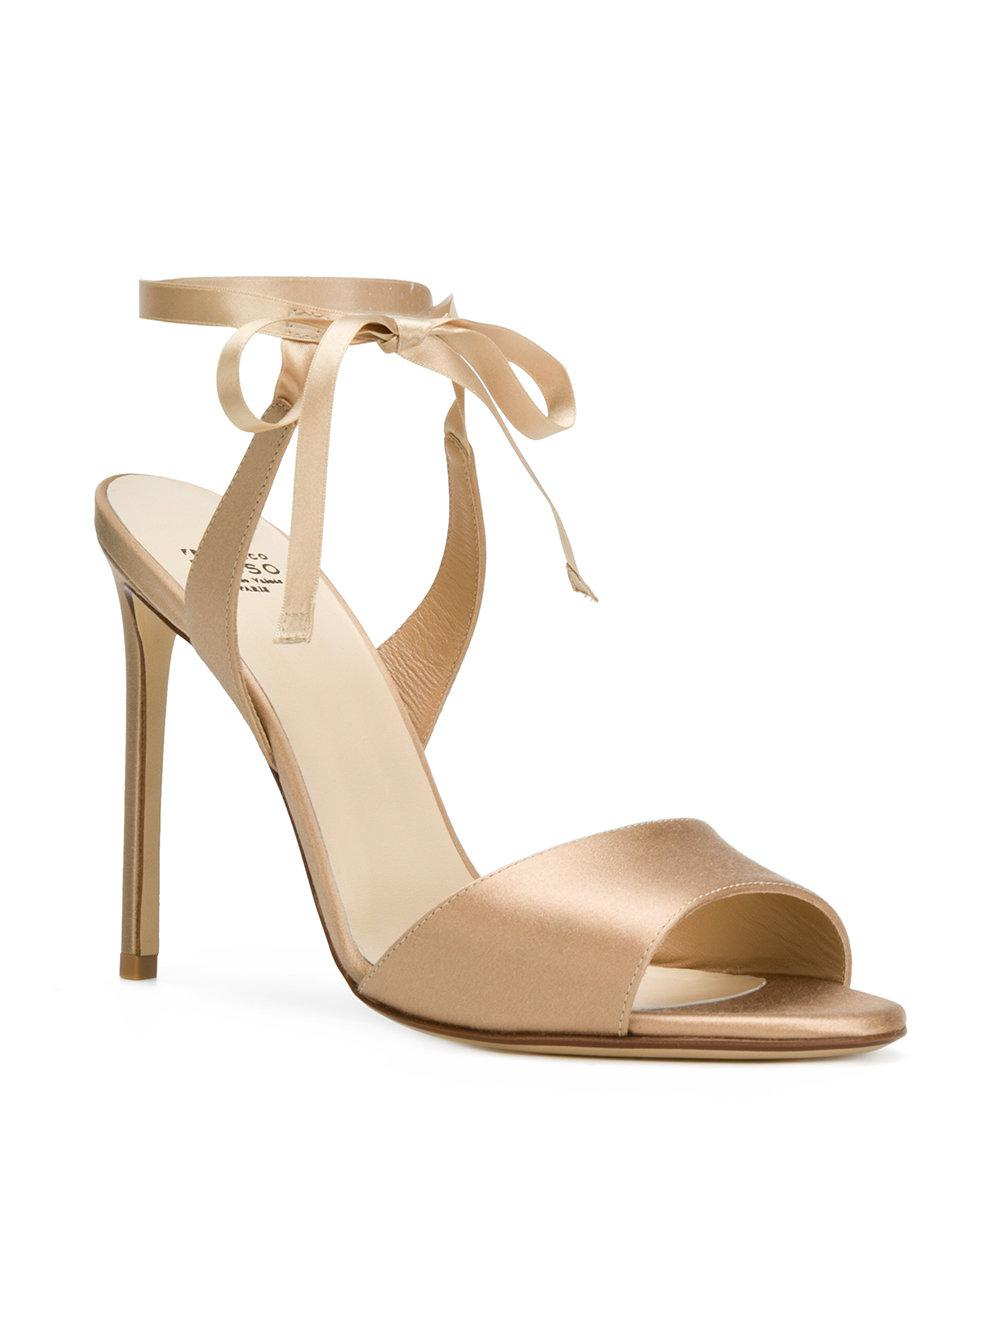 wrapped ankle sandals - Nude & Neutrals Francesco Russo Y5PPKijR